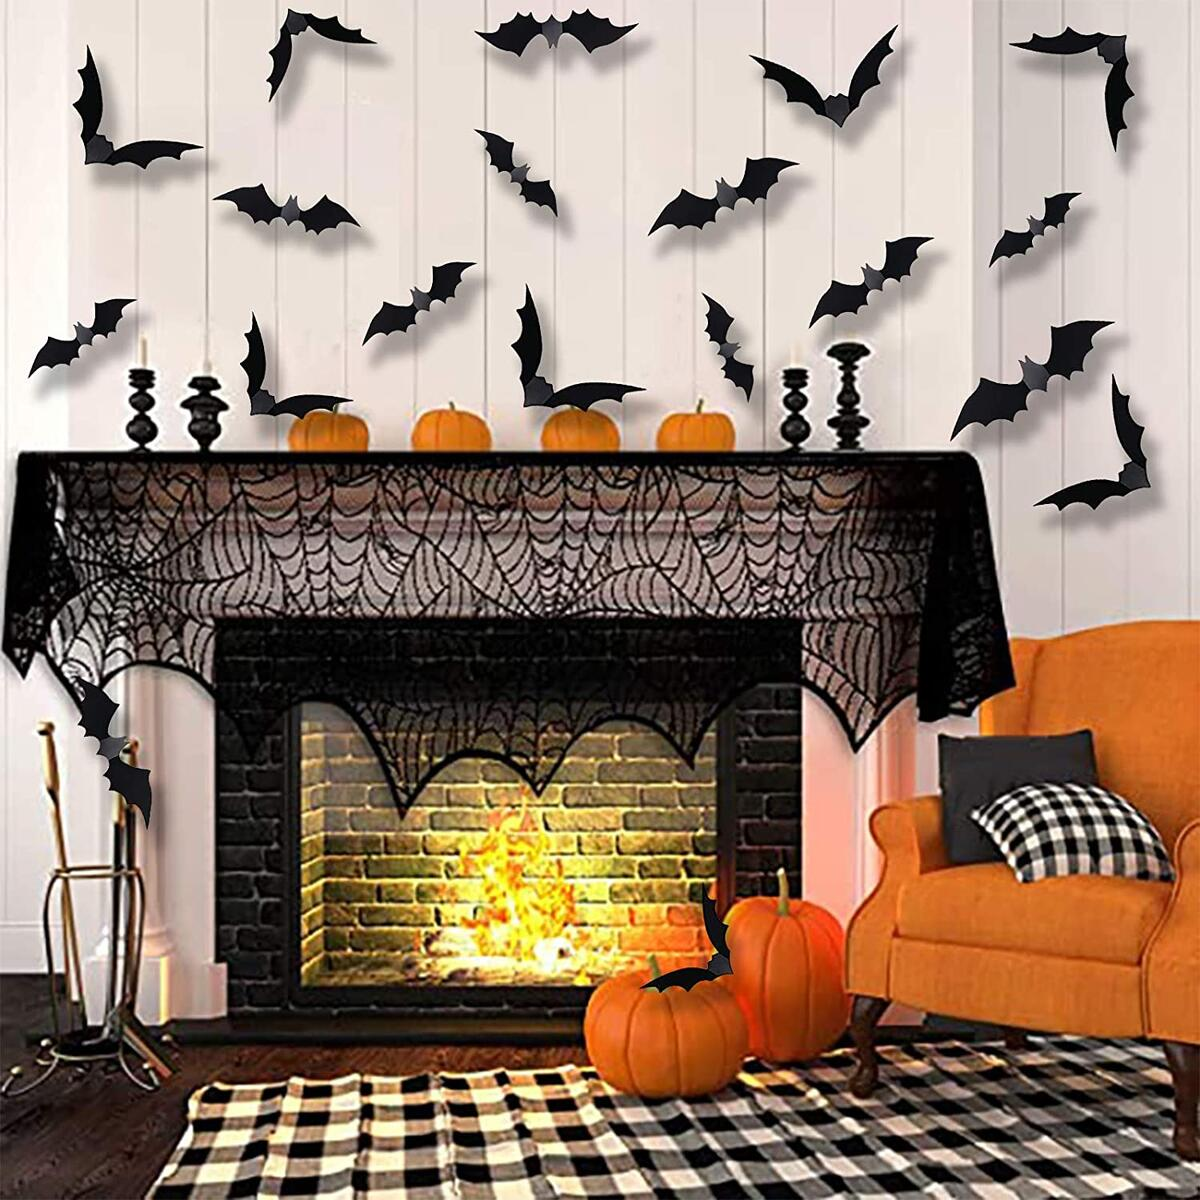 Halloween Party Supplies 3D Bats Decor (36 Pcs) - Large 4 Sizes Wall Decal Wall Sticker, Halloween Wall Decoration Halloween Decorations Clearance